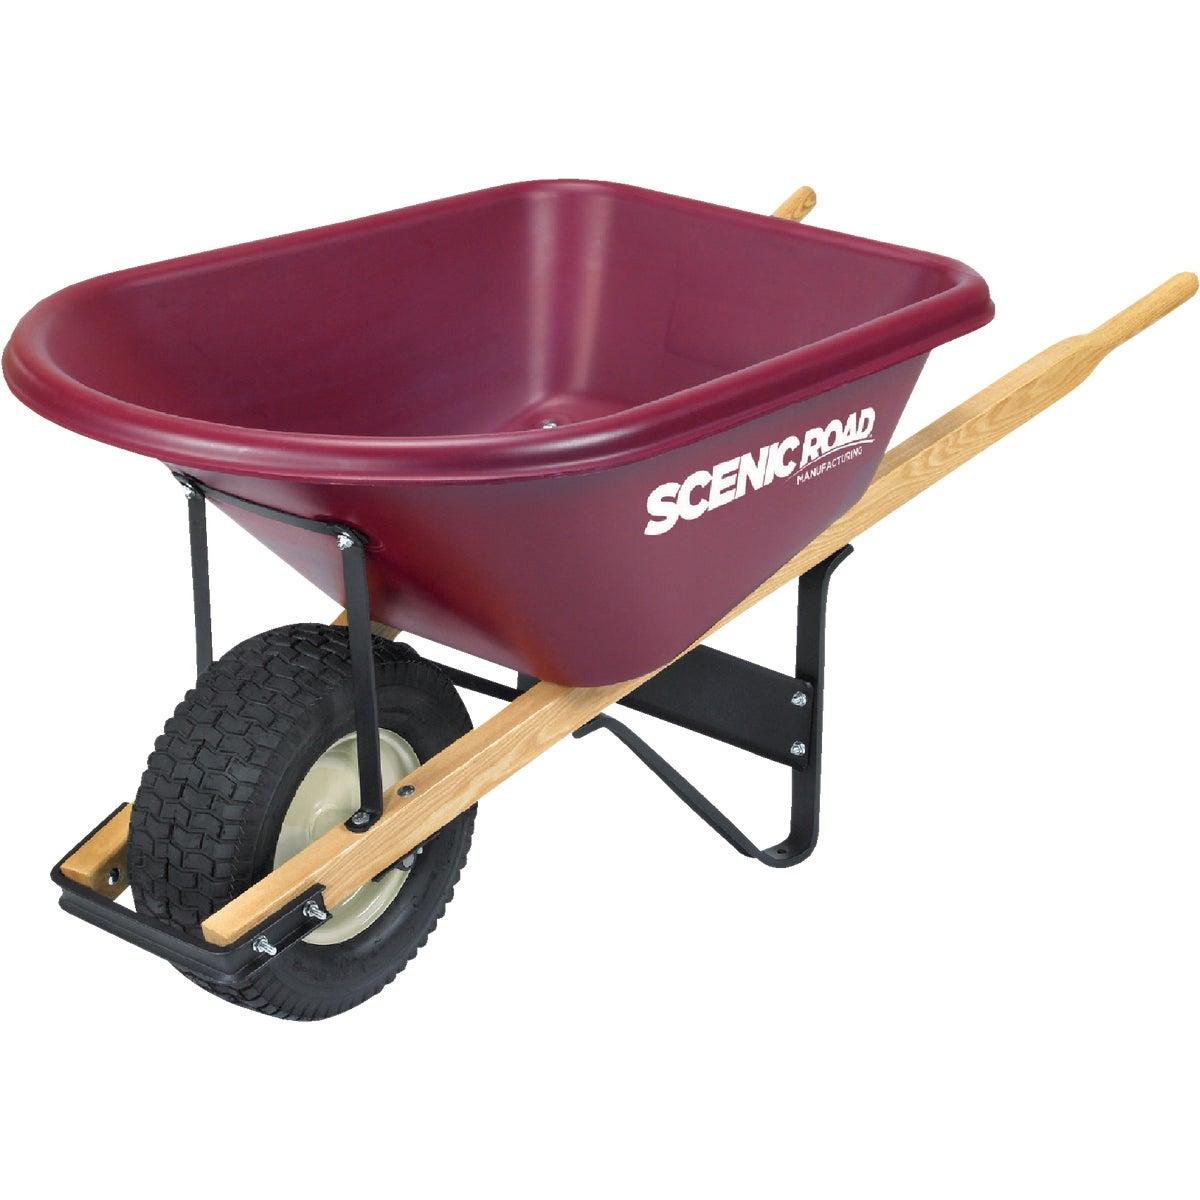 Scenic Road Single Wheel Tradesmen Duty Poly Wheelbarrow, M6-1T